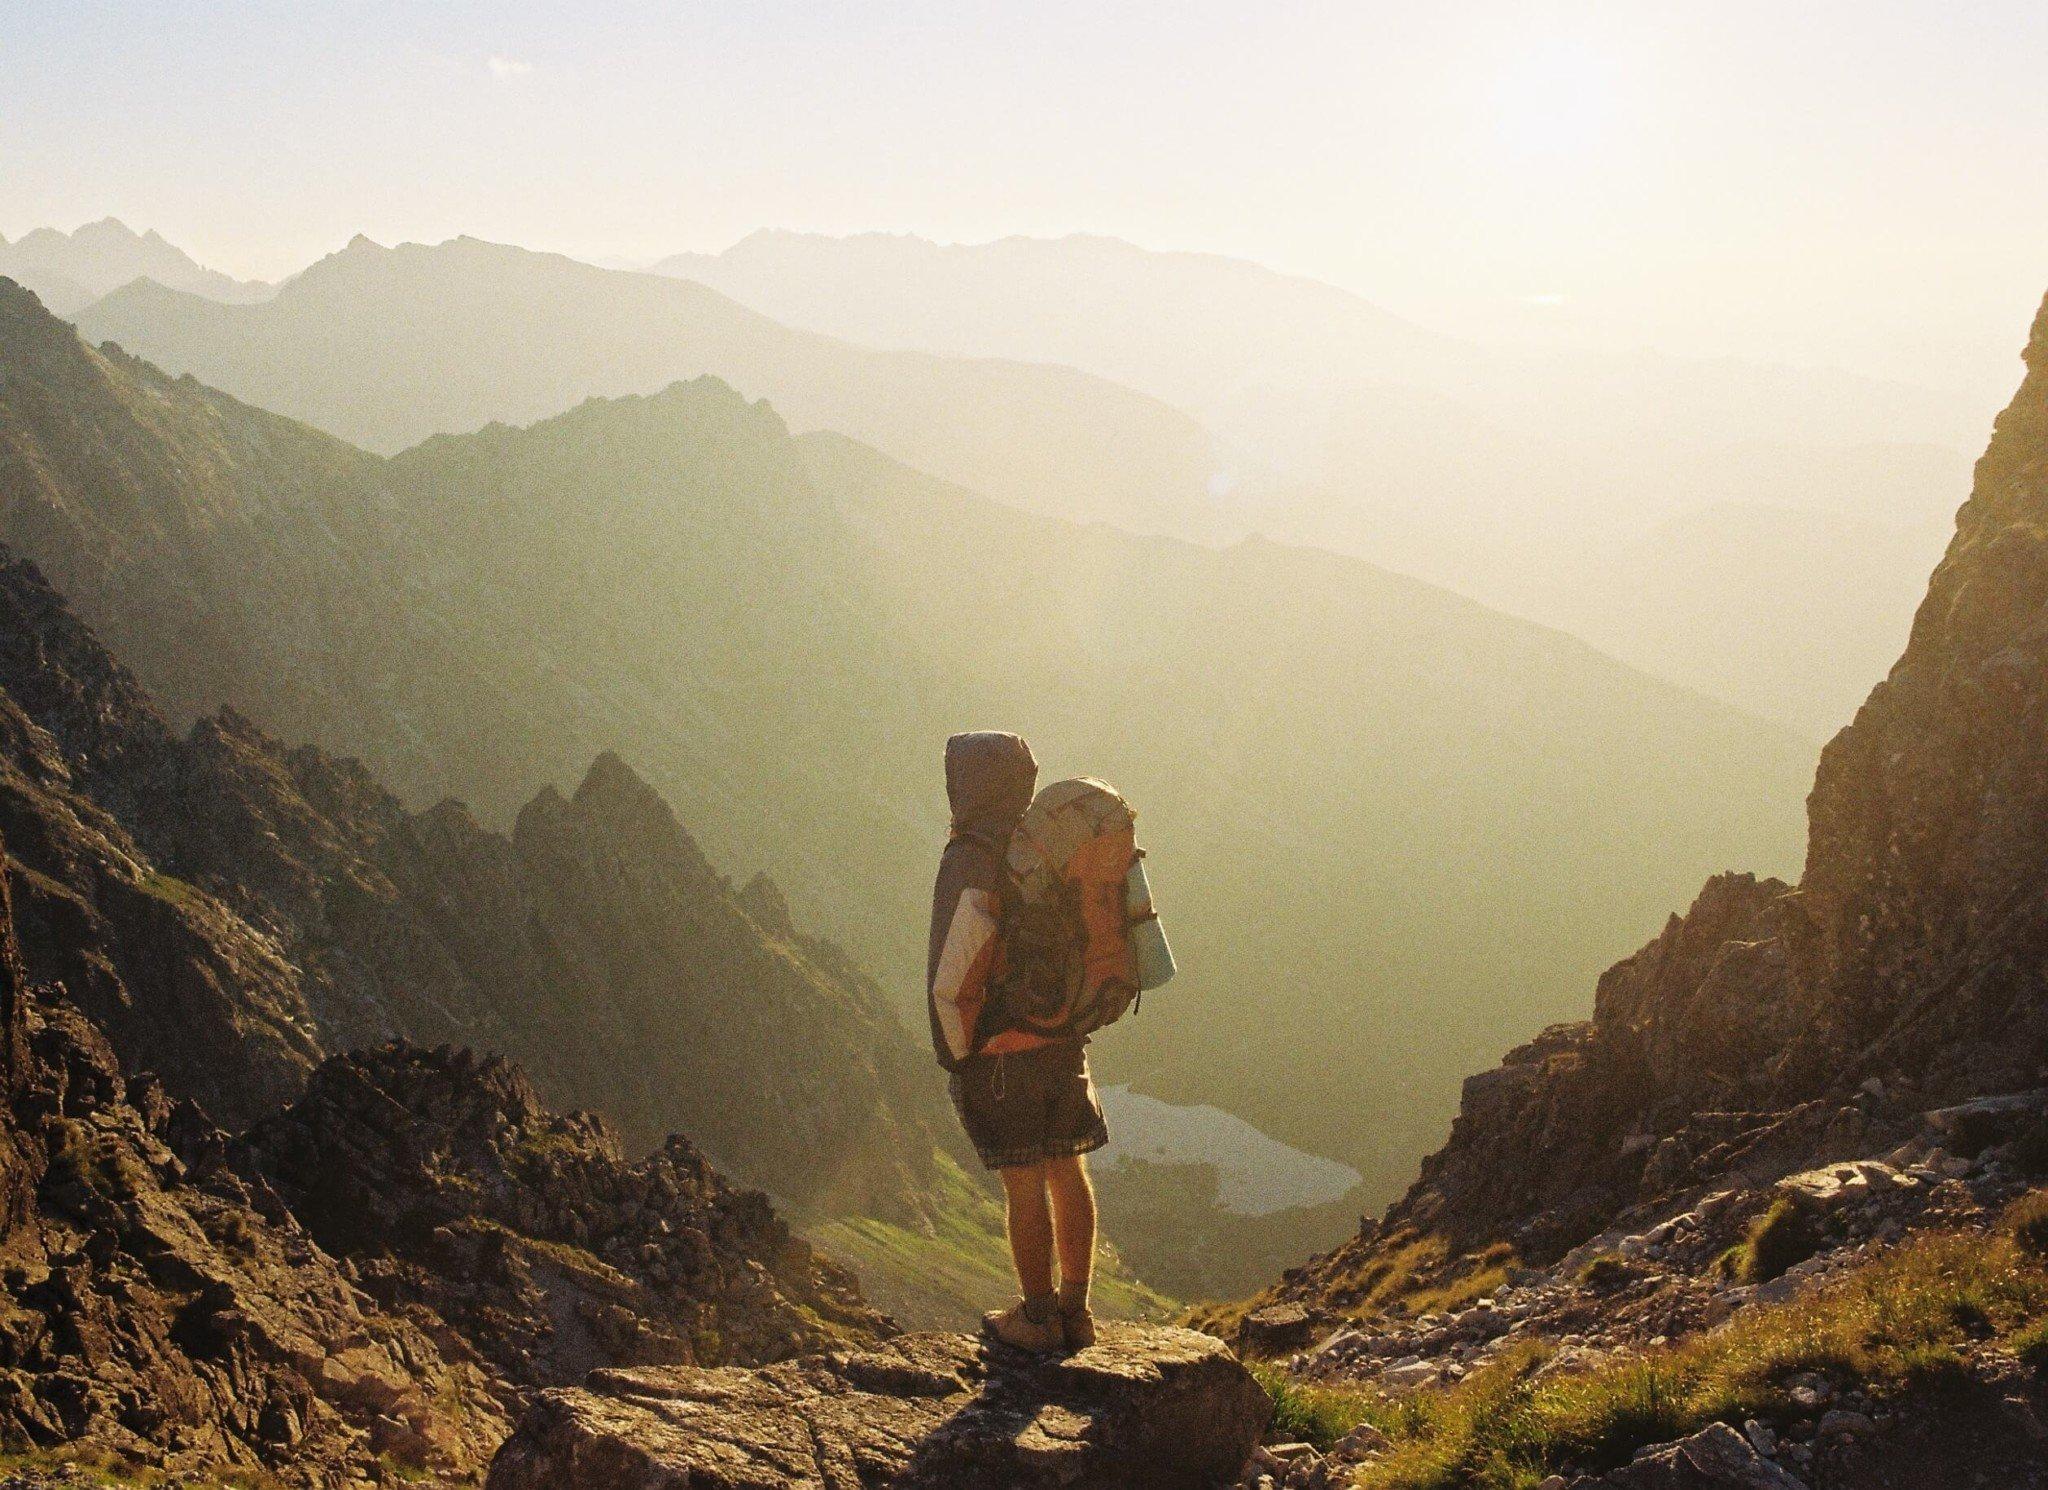 thru-hiking